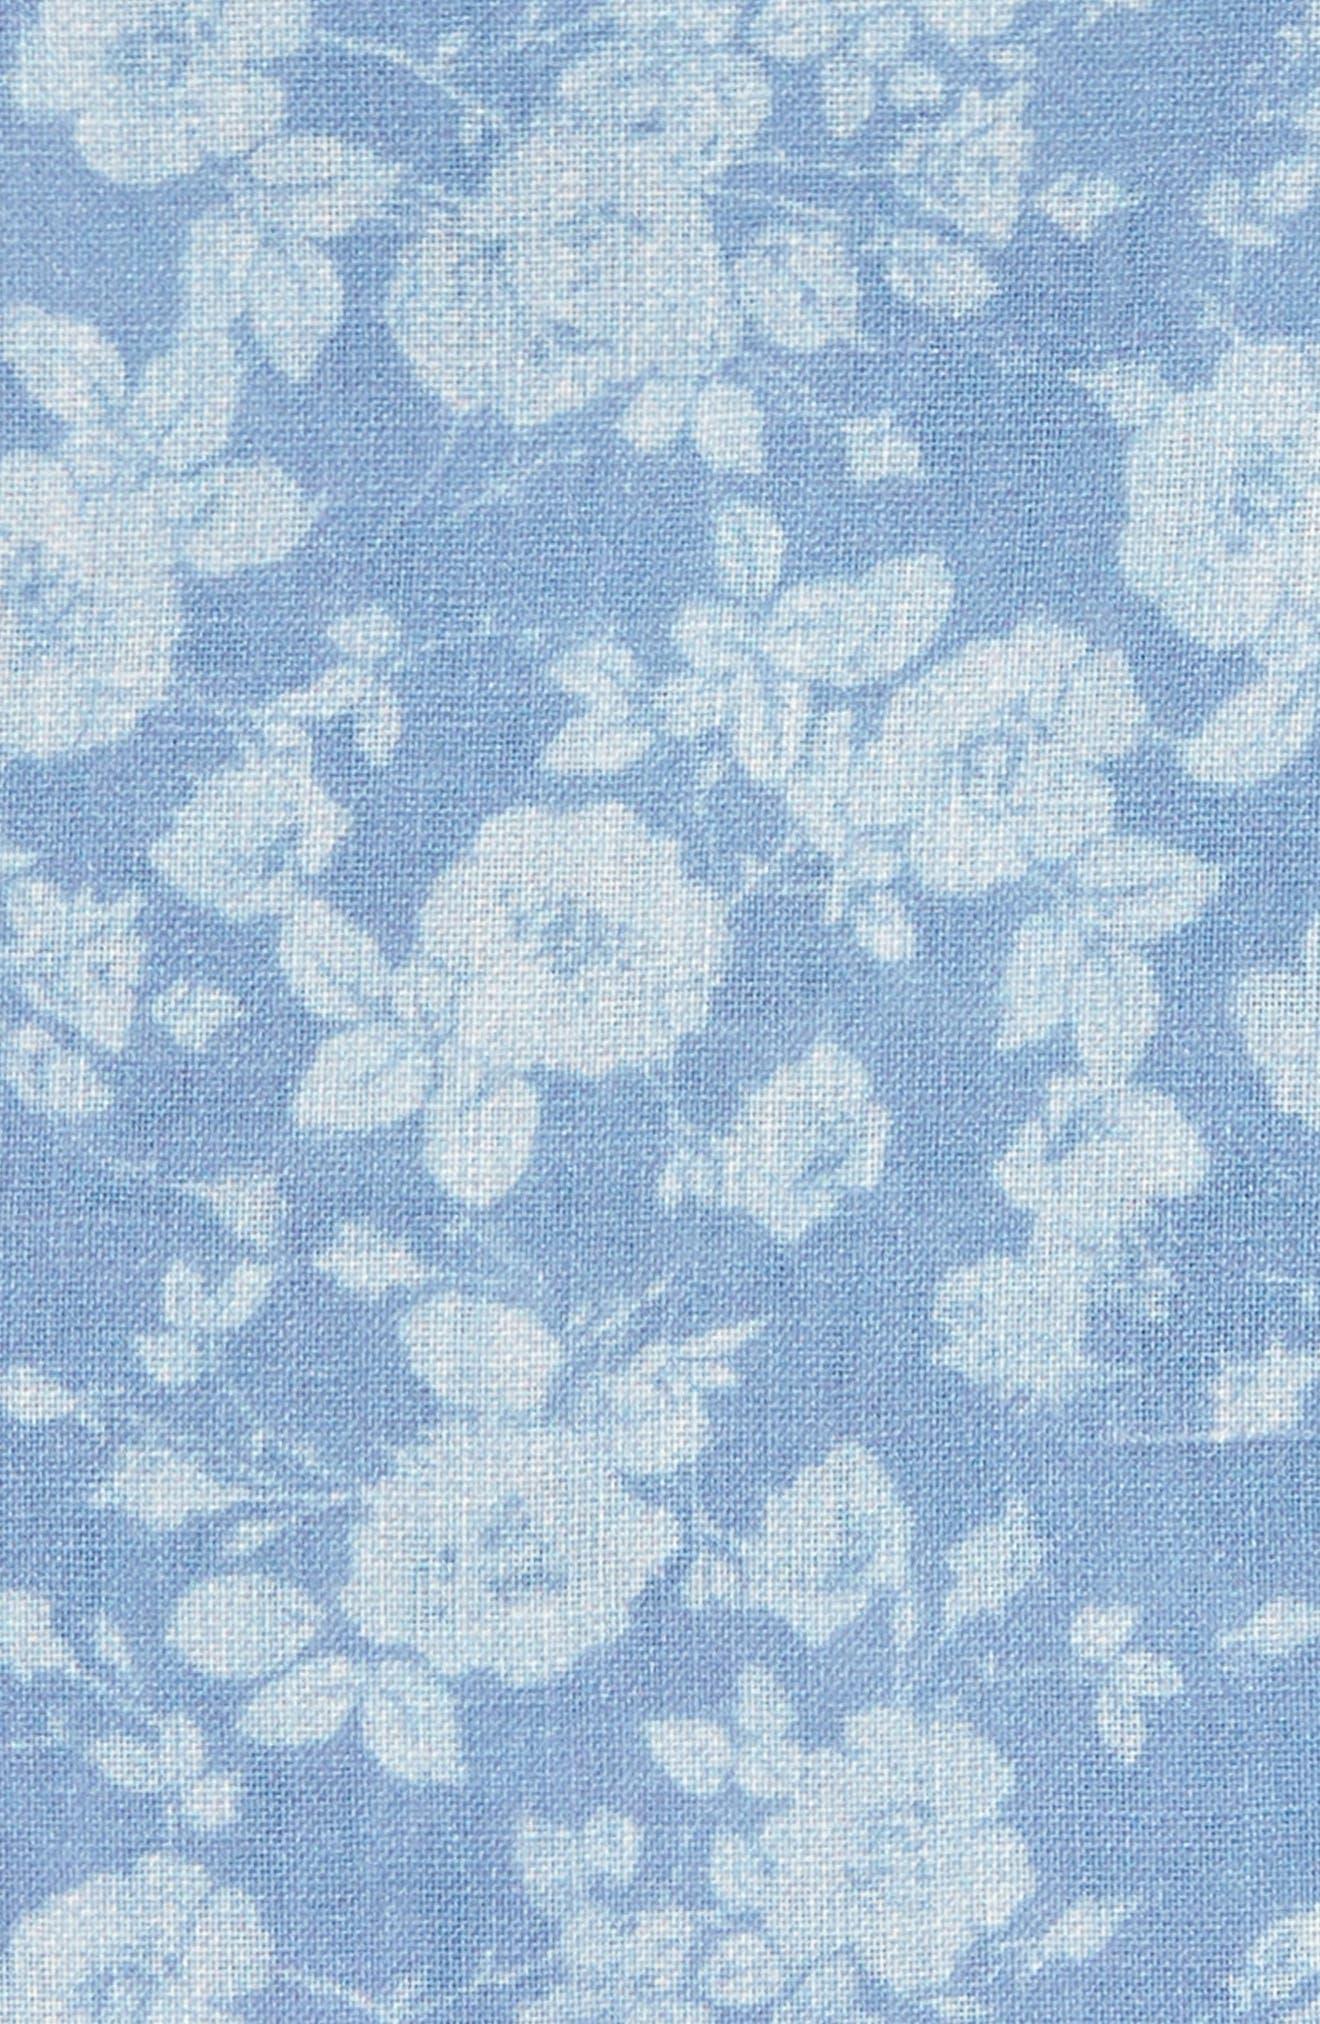 Buds Floral Linen Pocket Square,                             Alternate thumbnail 3, color,                             Light Blue